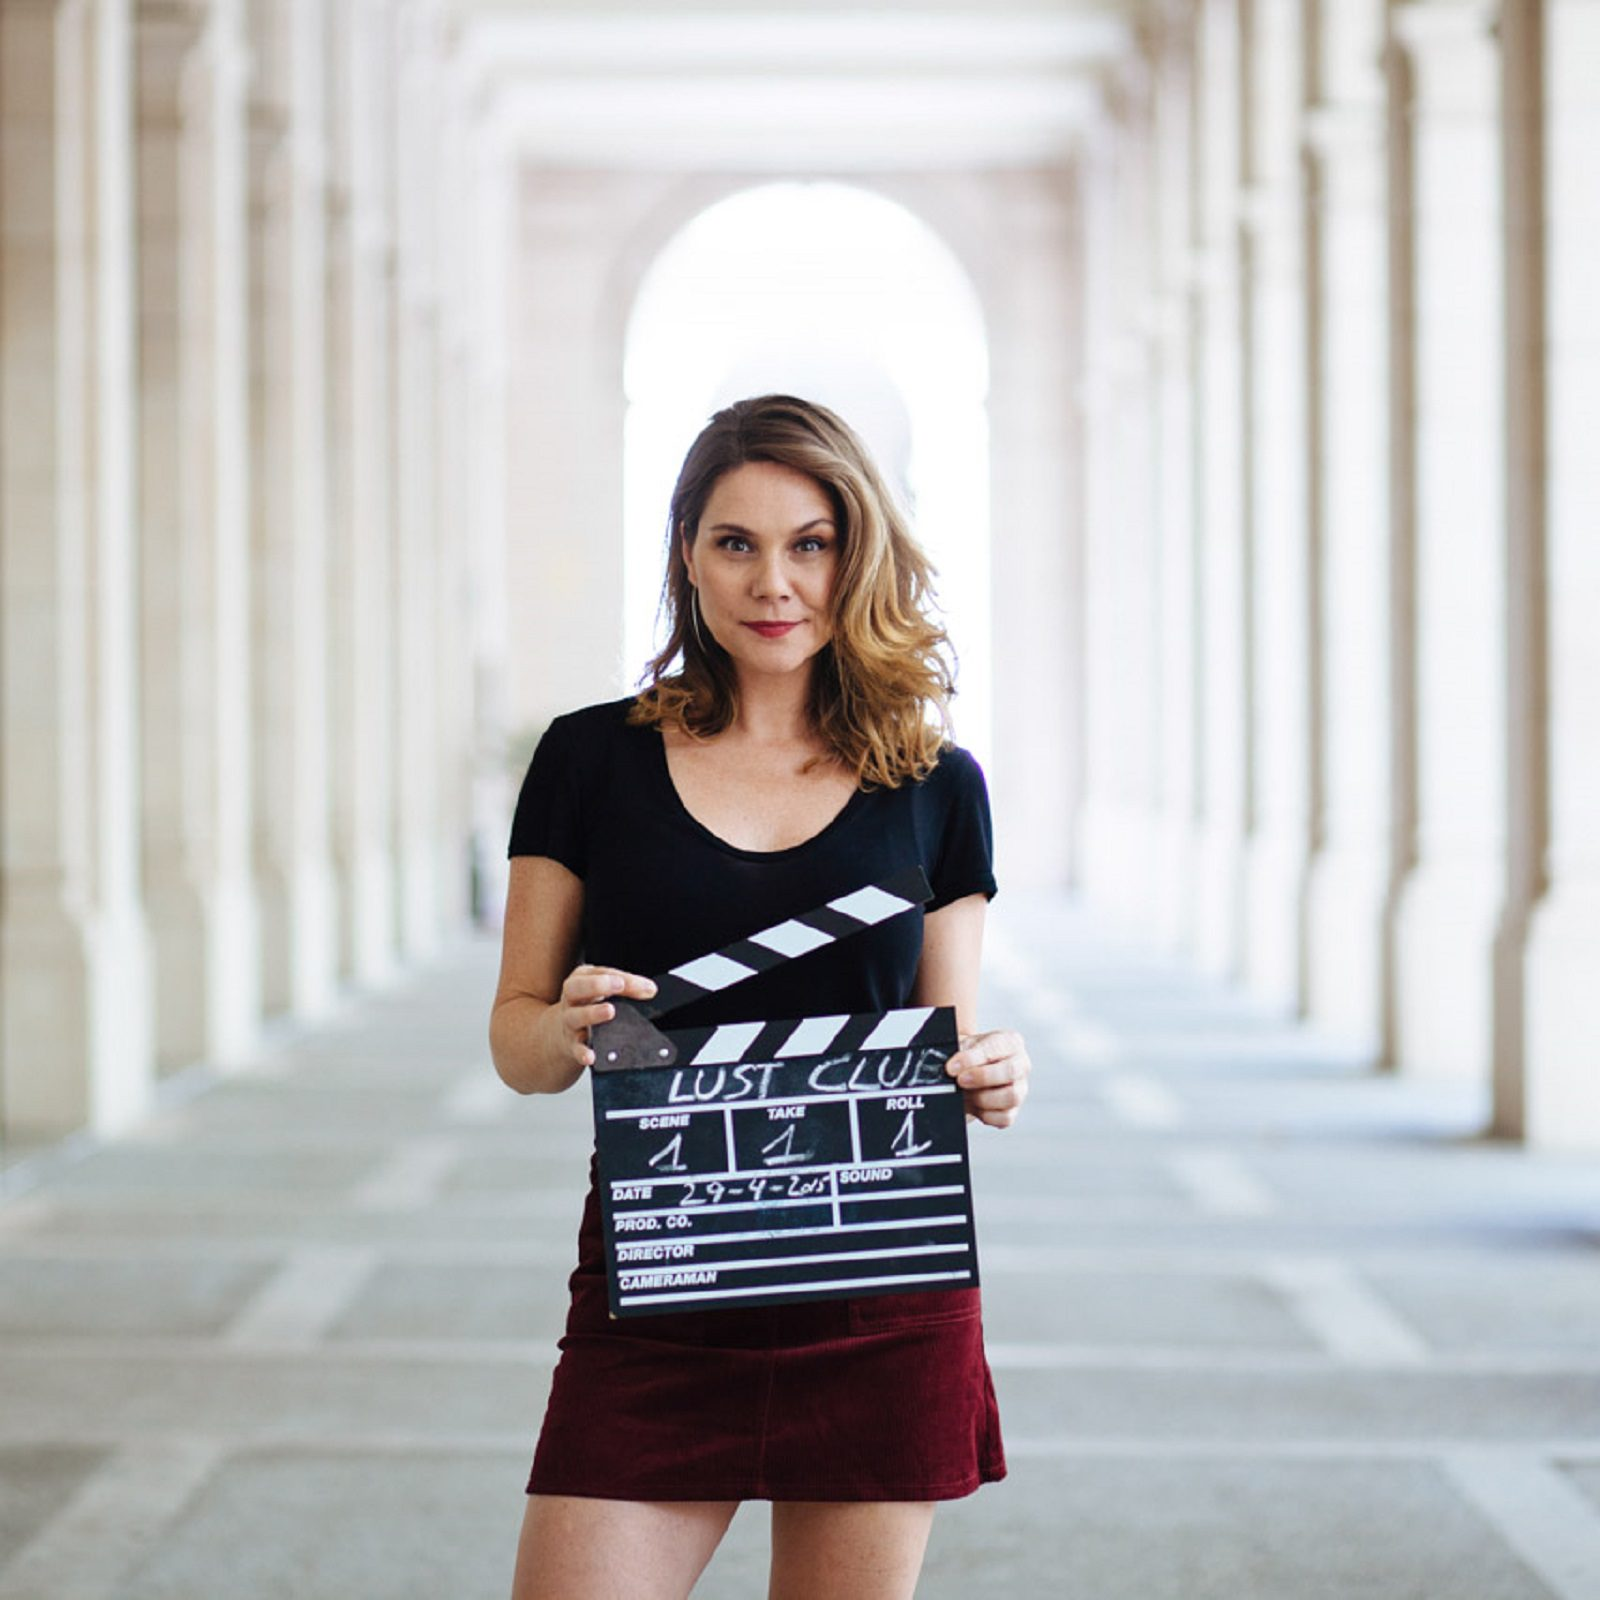 Amateur Adolescente Fotos Porno erika lust ('hot girls wanted: turned on'): cine, porno y